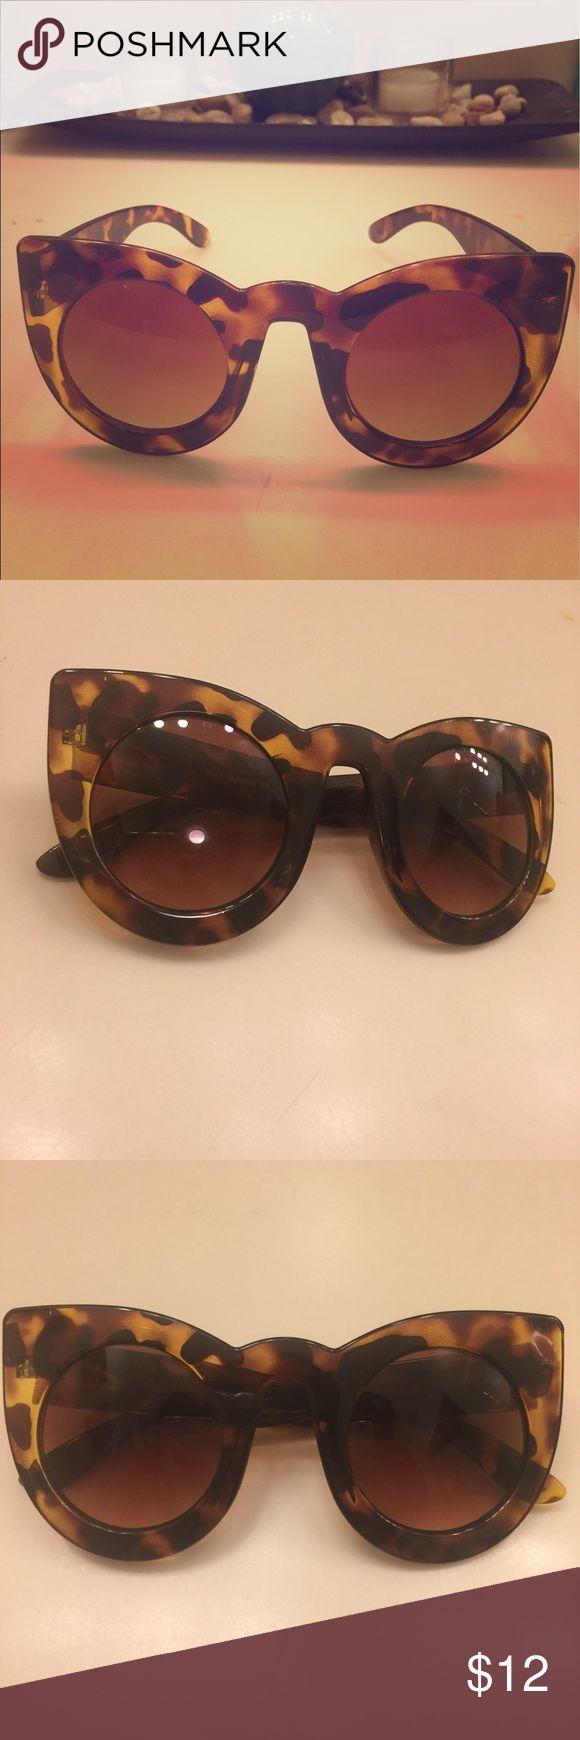 Tortoise Cat Eye Sunglasses Brand new tortoise-colored Cat 🐱 Eye sunglasses. 😎  Open to offers. #cateye #shades #sunglasses Accessories Glasses